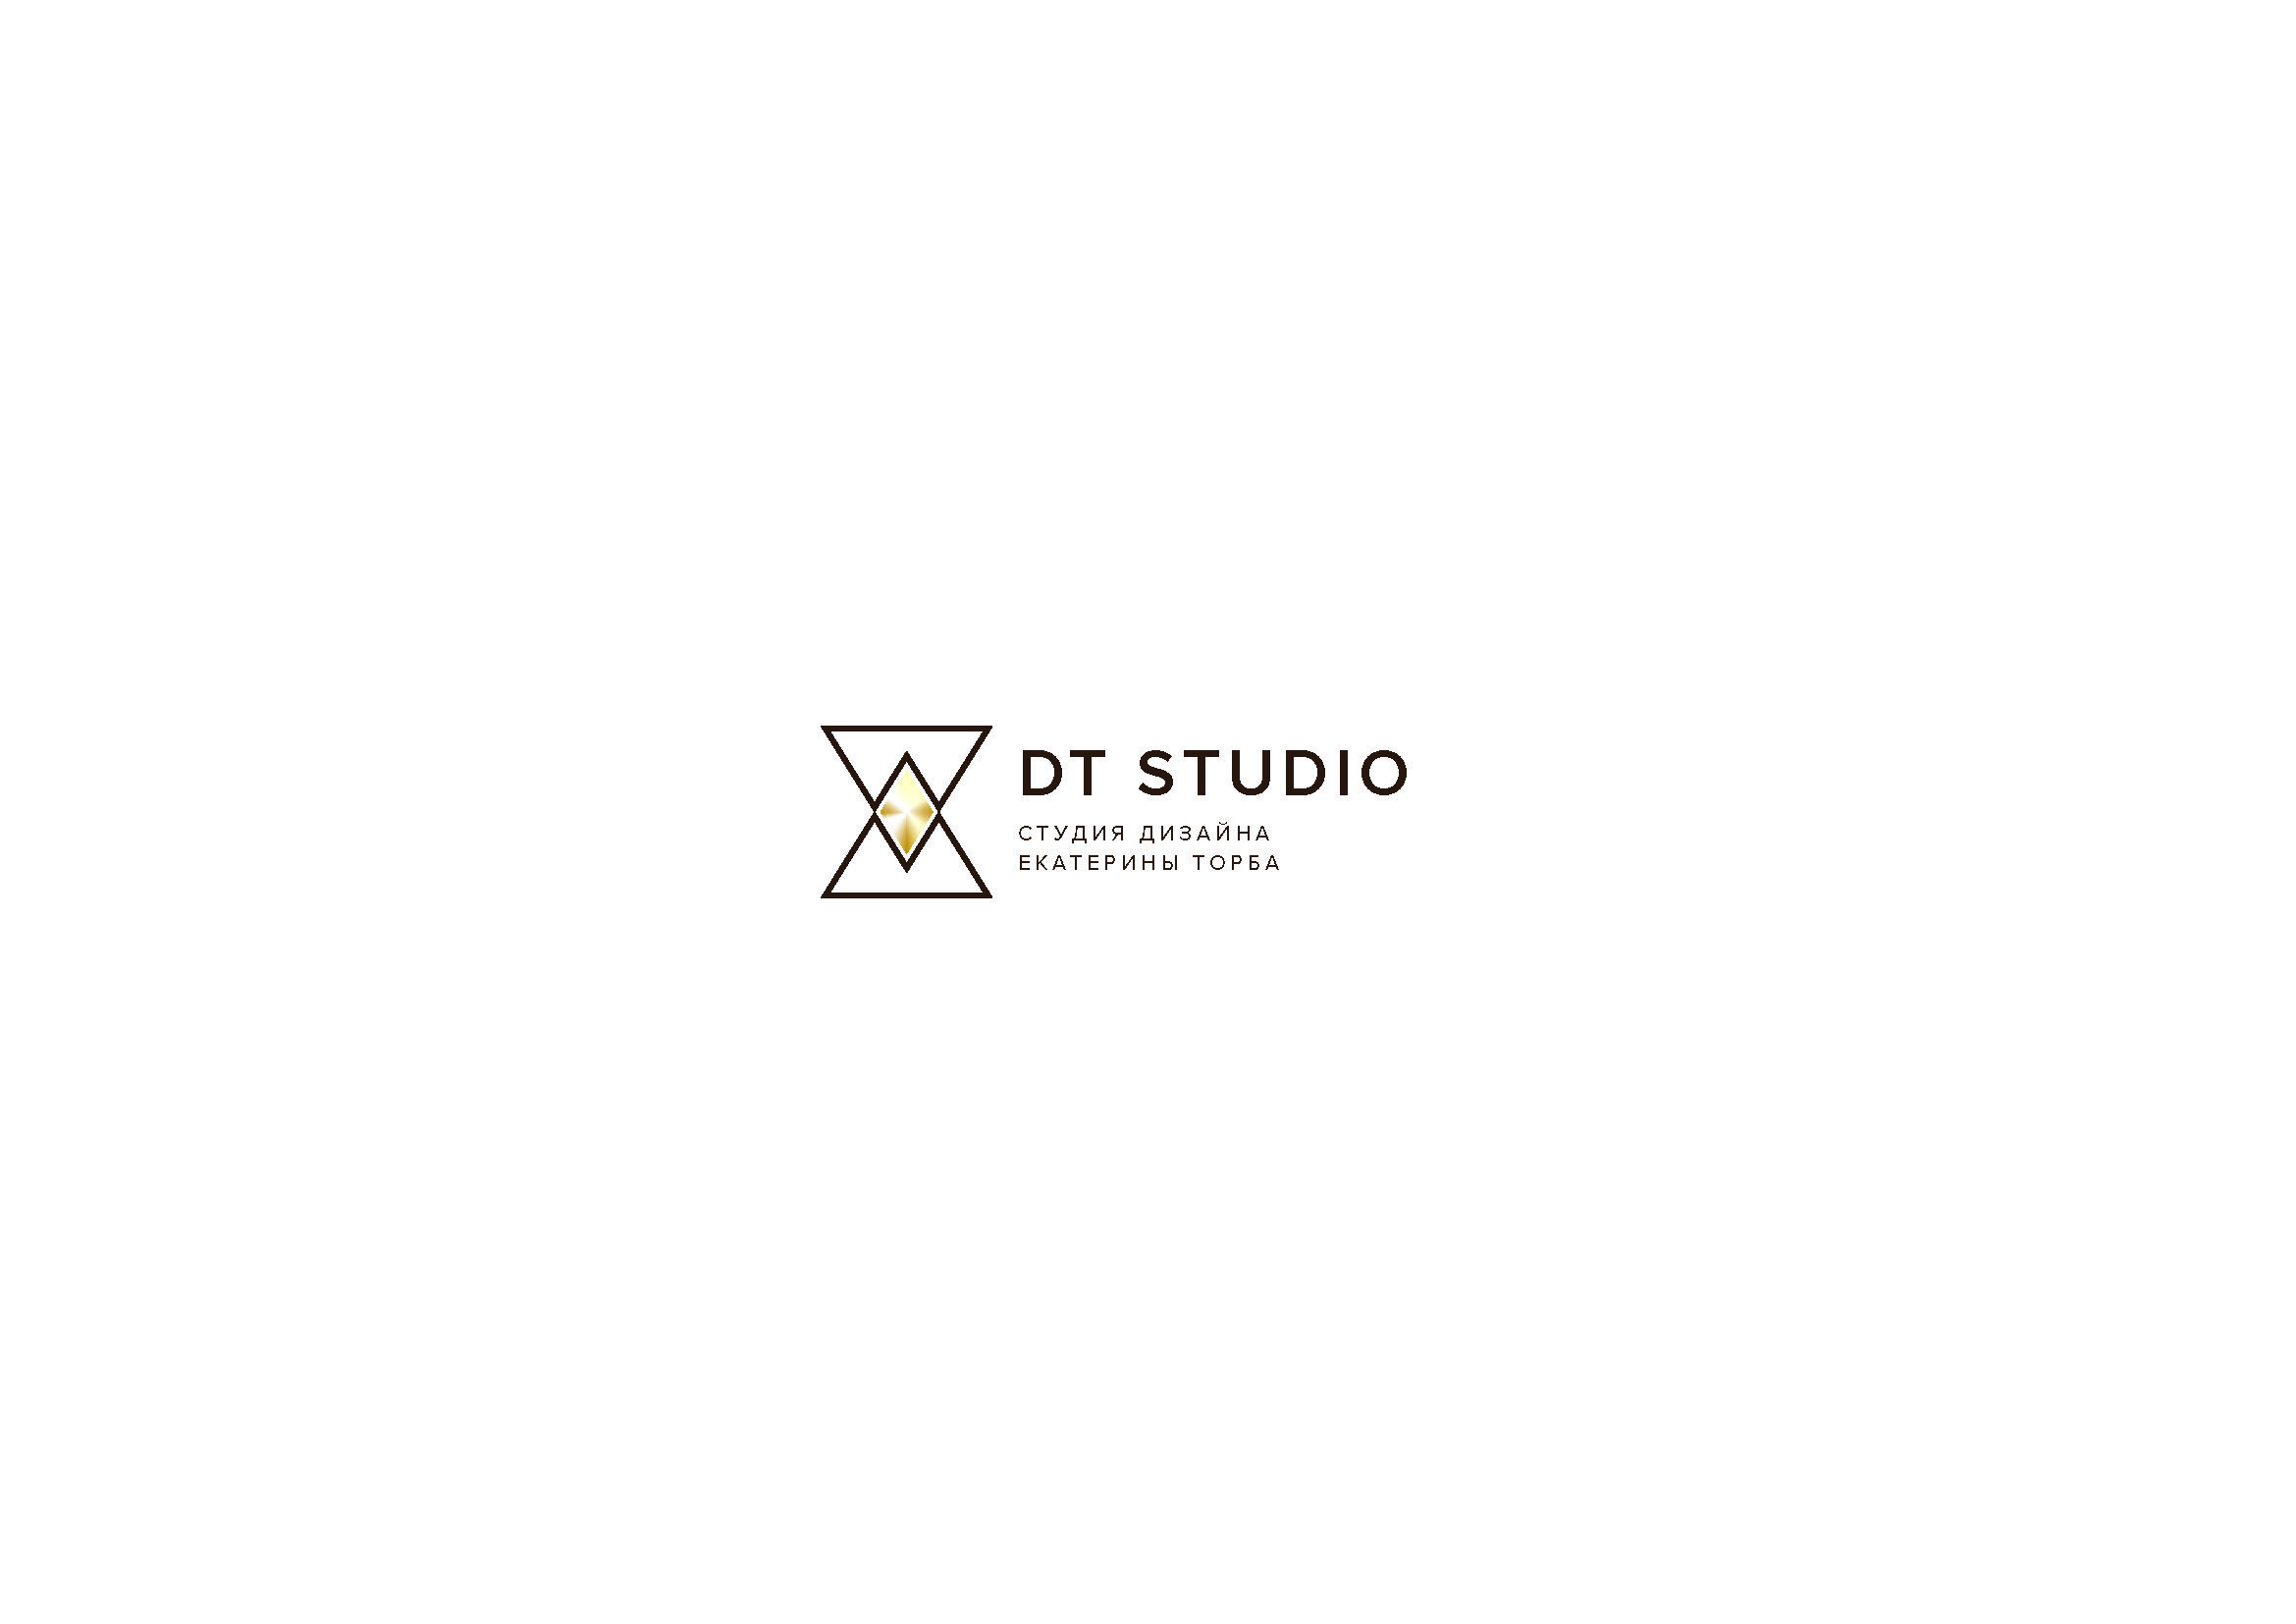 DT_Logo_Preview_LQ (2)_Страница_7